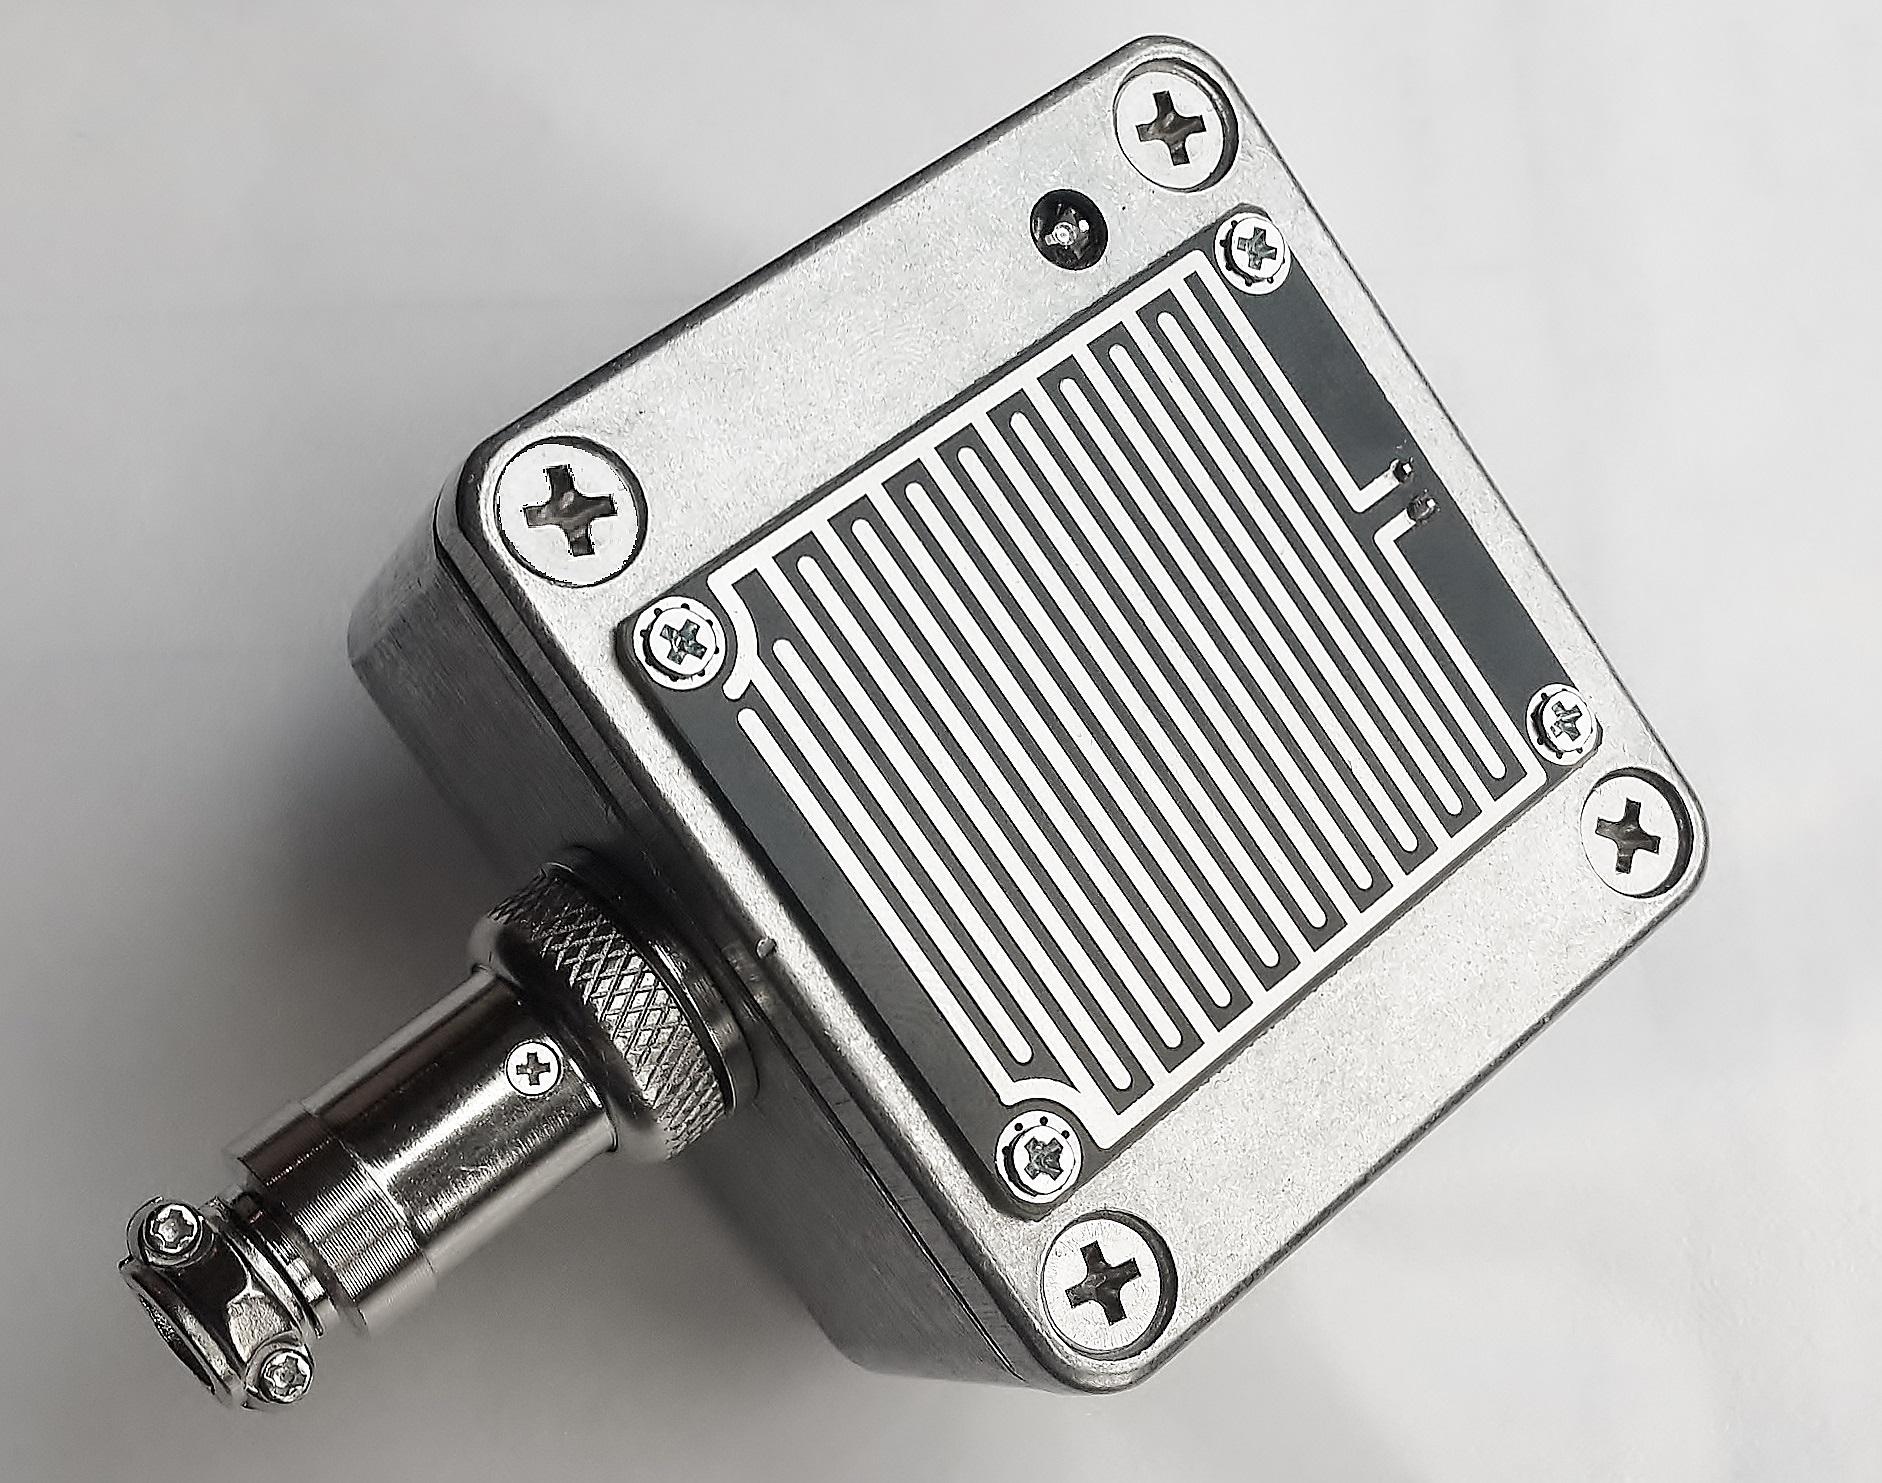 Sensor and Detector System